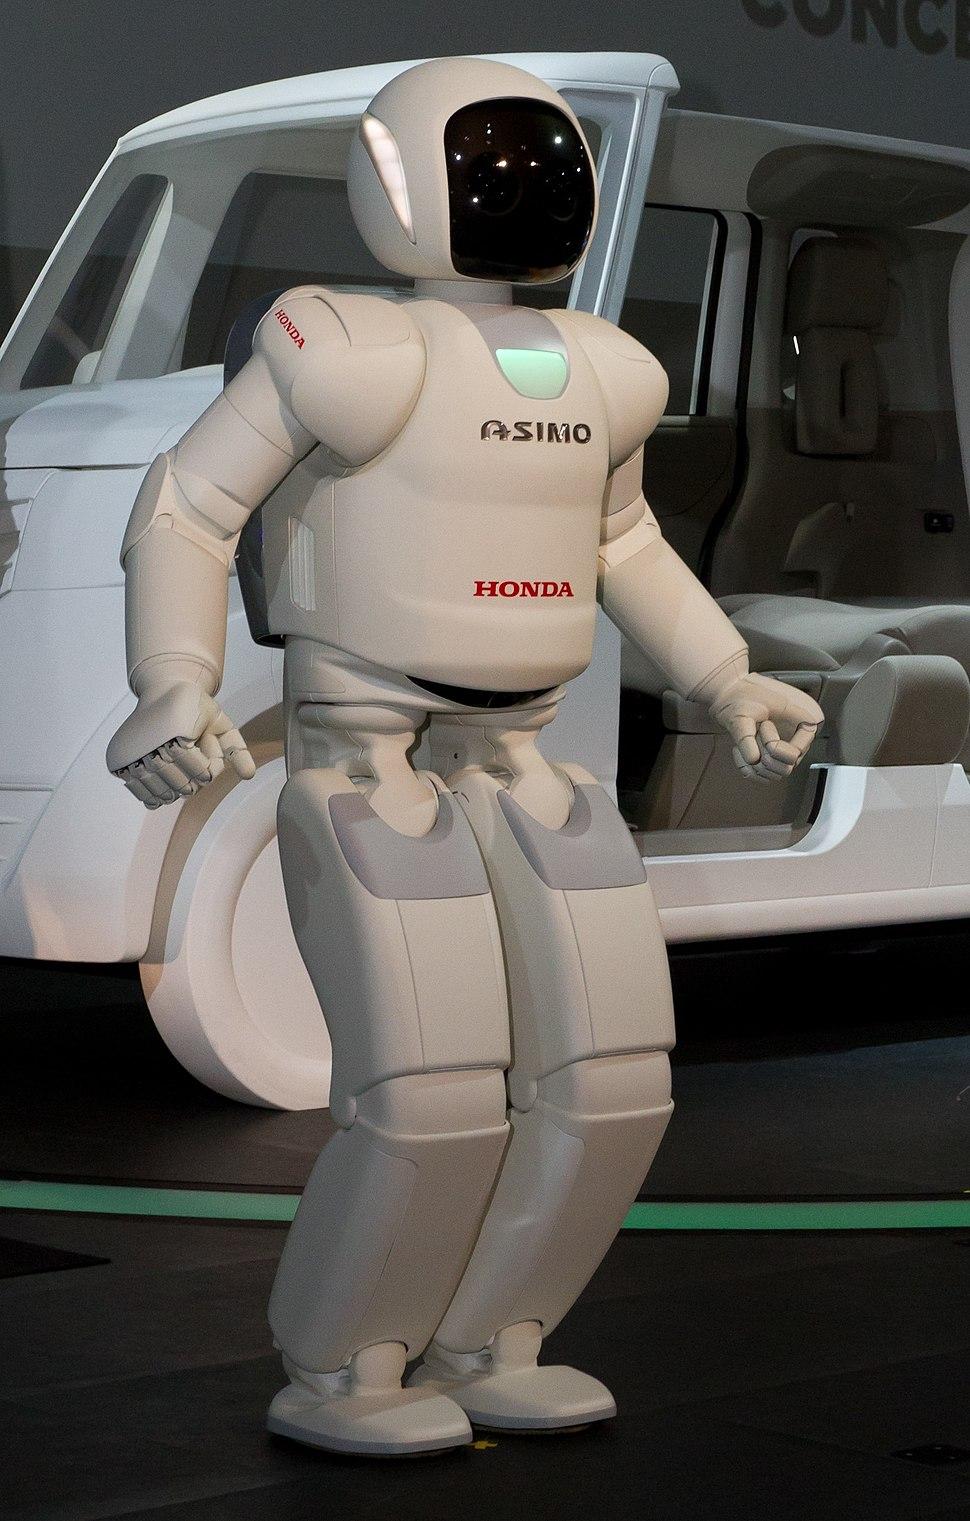 Honda ASIMO (ver. 2011) 2011 Tokyo Motor Show